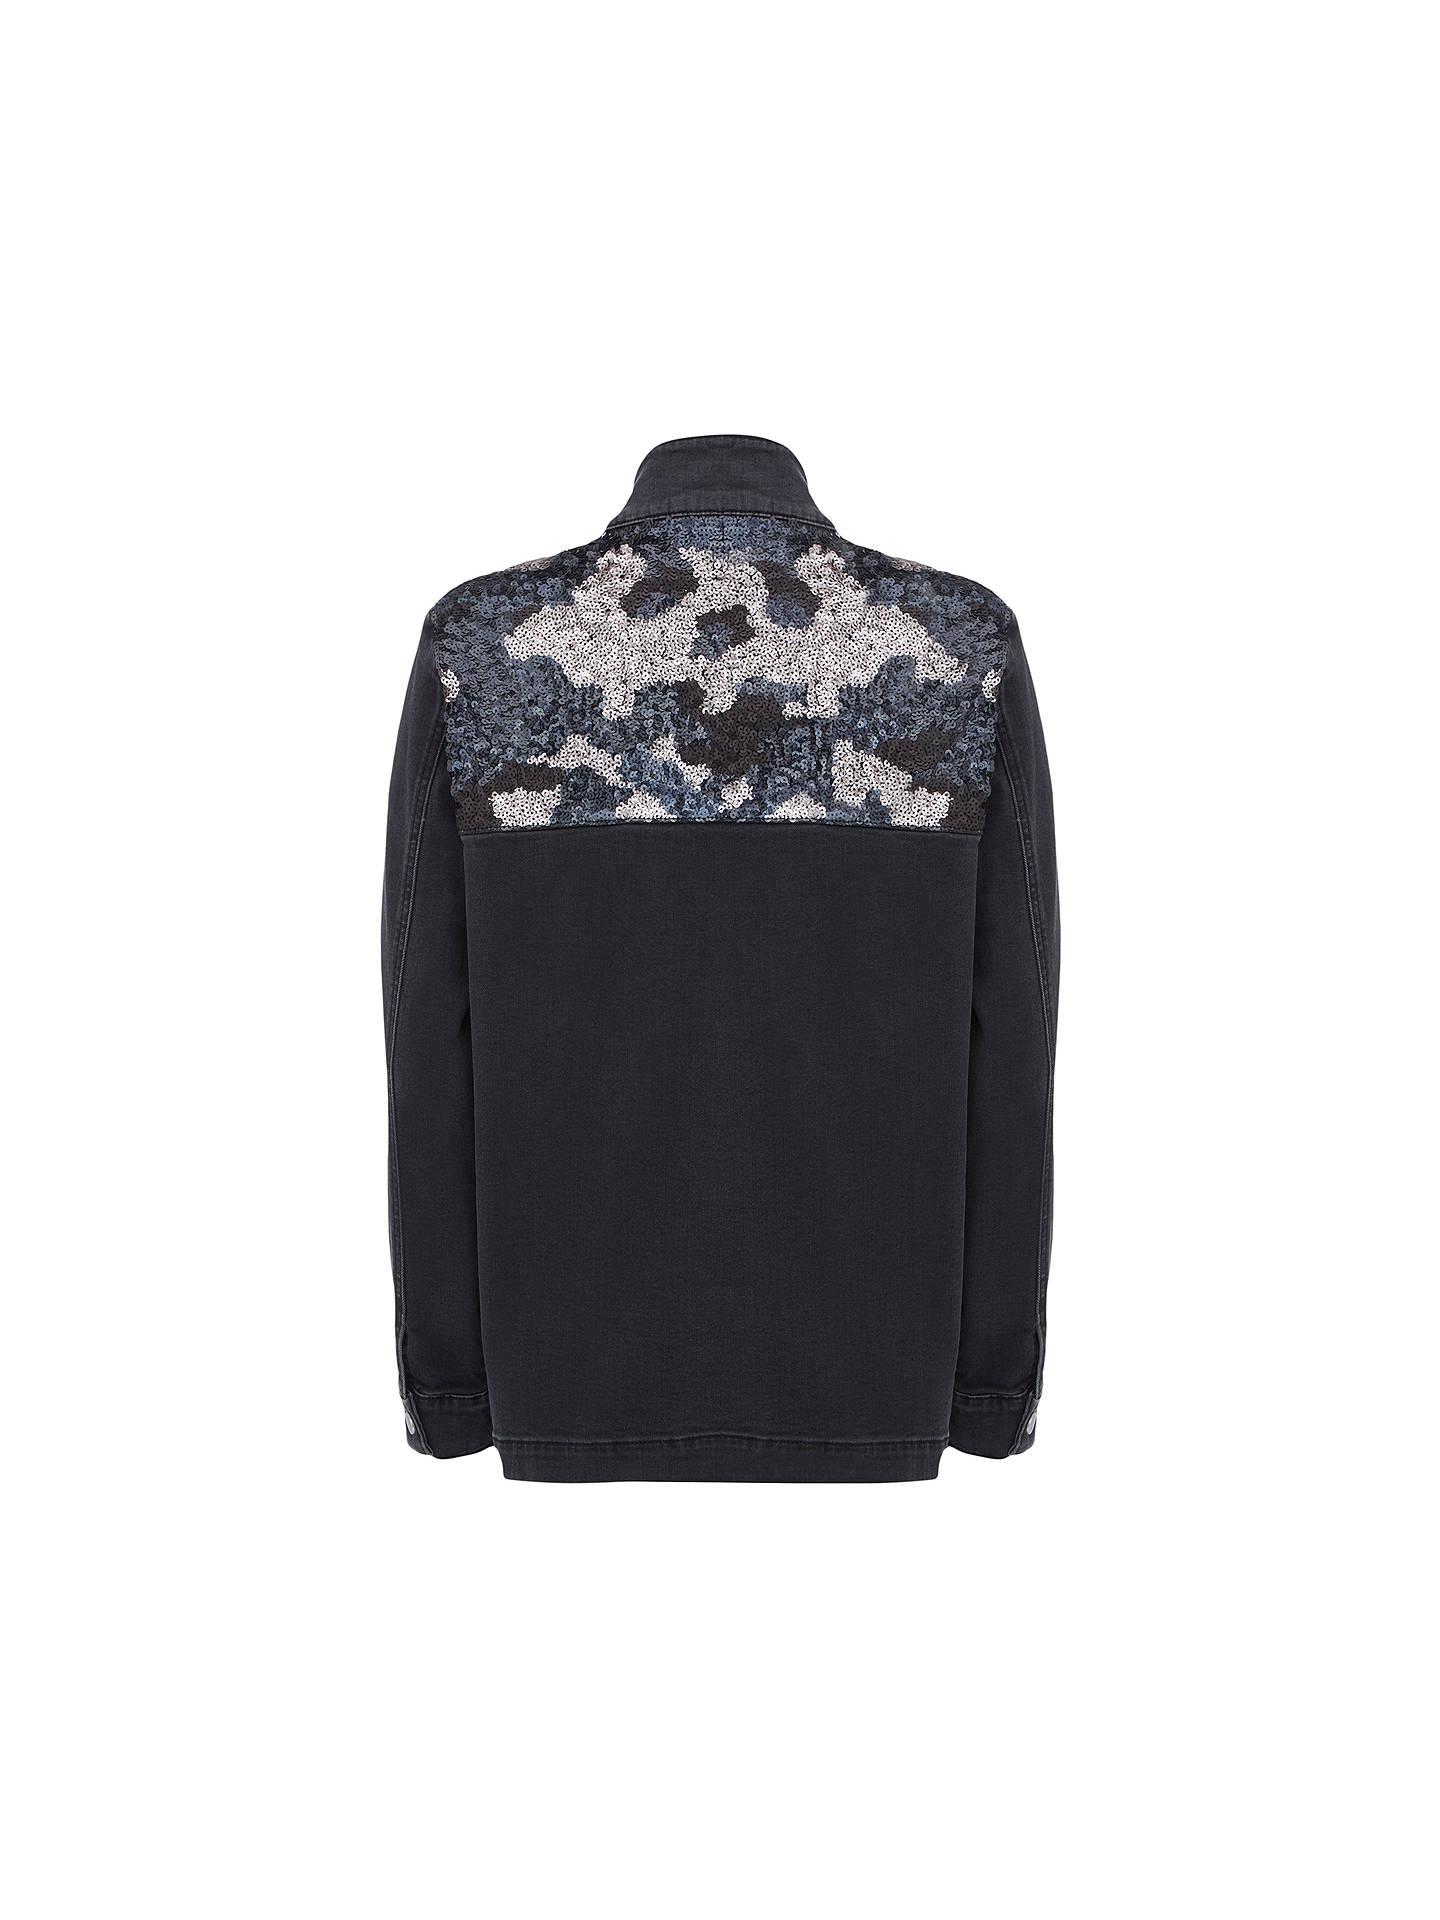 cddaba22aea26 ... Buy Mint Velvet Sequined Jacket, Black, 10 Online at johnlewis.com